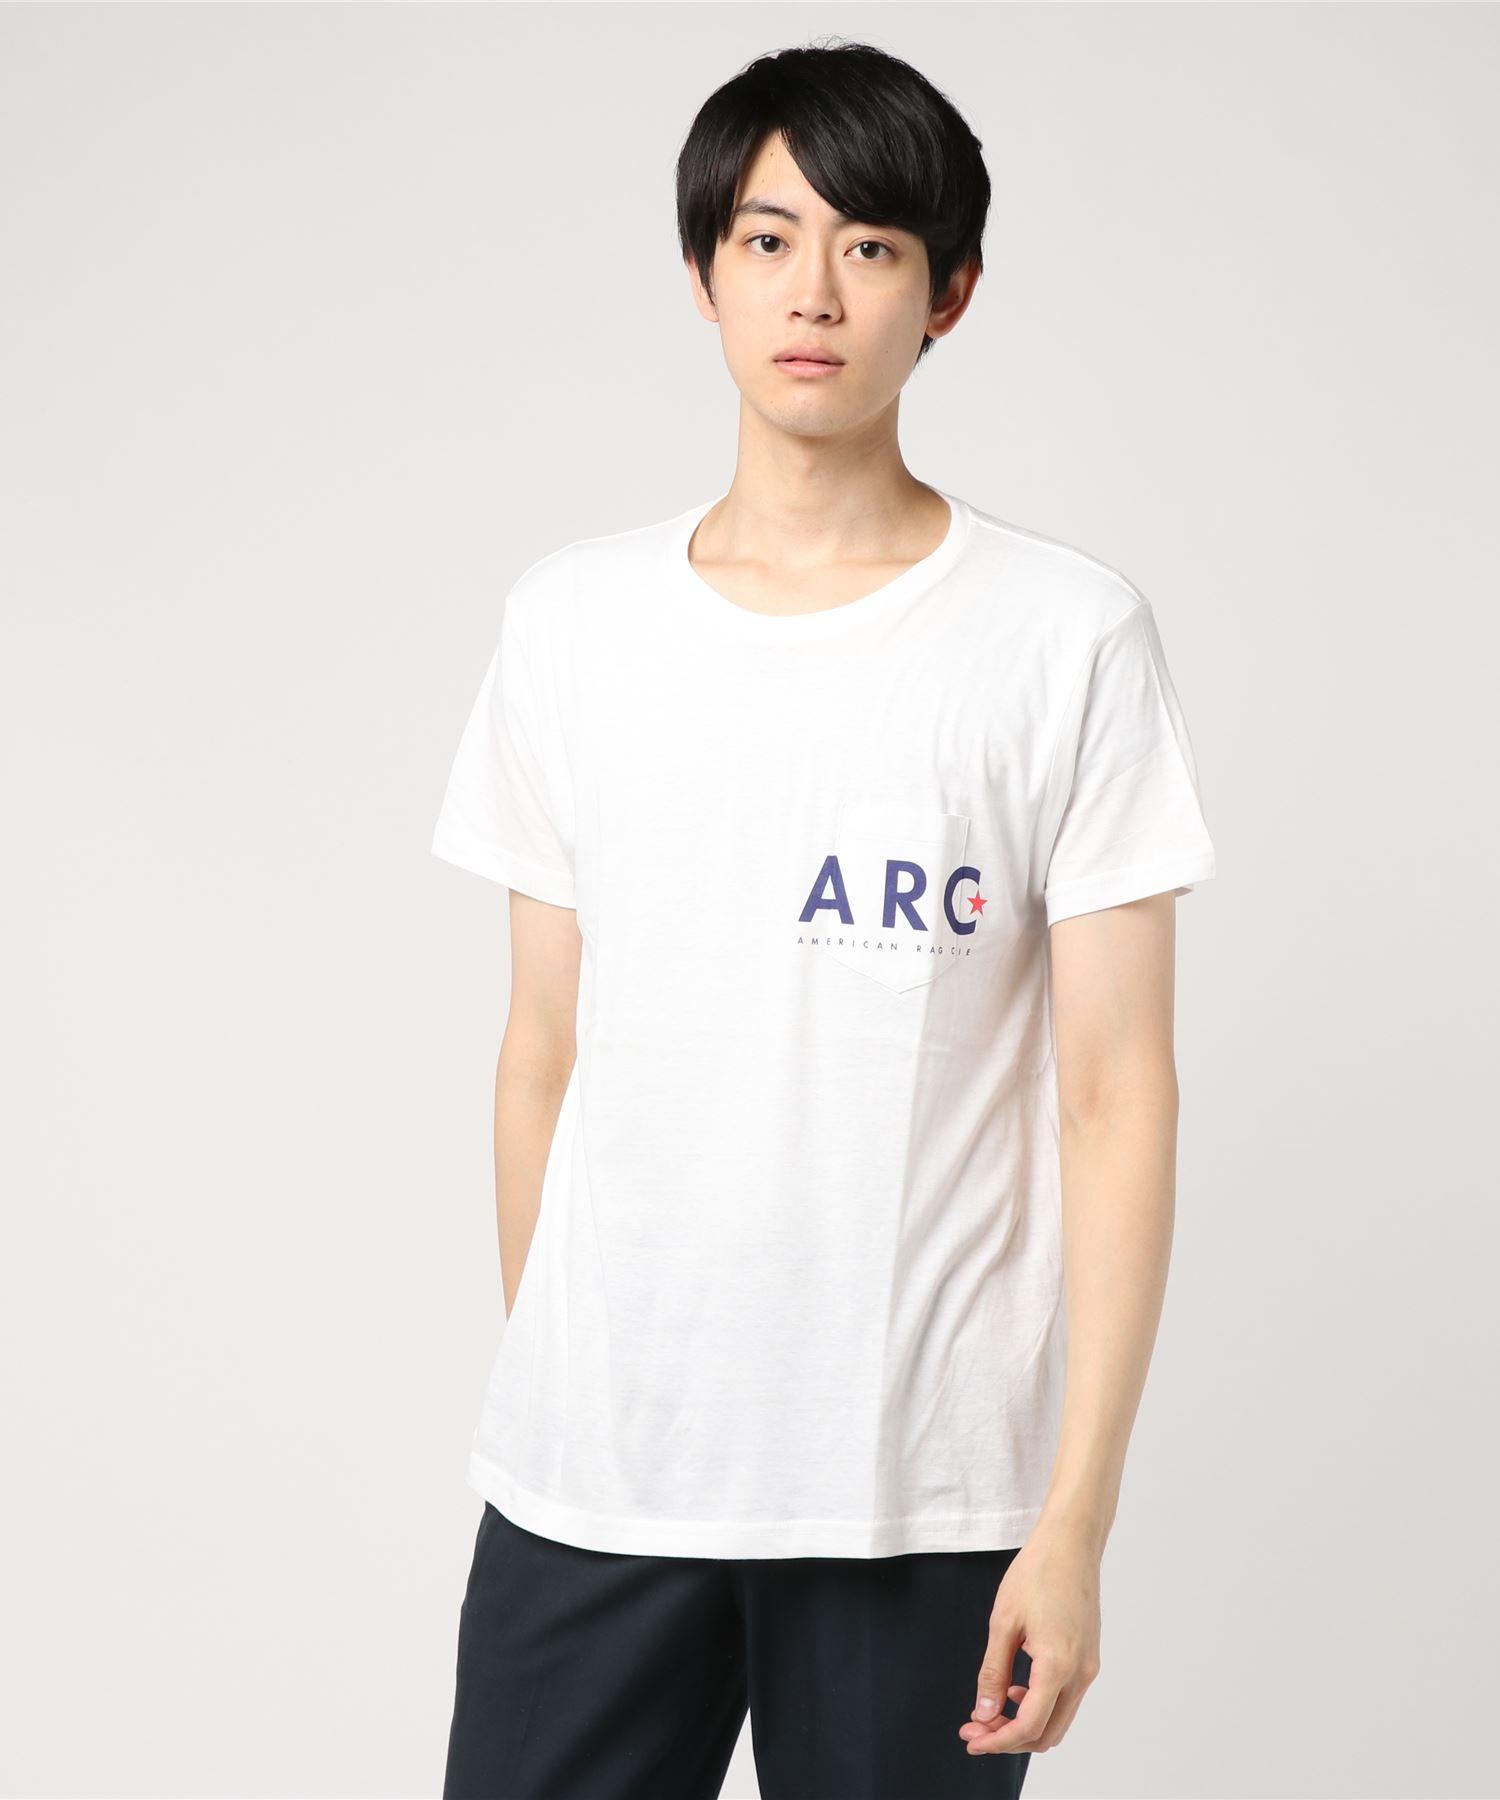 AMERICAN RAG CIE アメリカンラグシー / ARC Out Of The Box Simple Logo Print Pocket T Shirt ARCはみ出しシンプルロゴプリント1ポケT